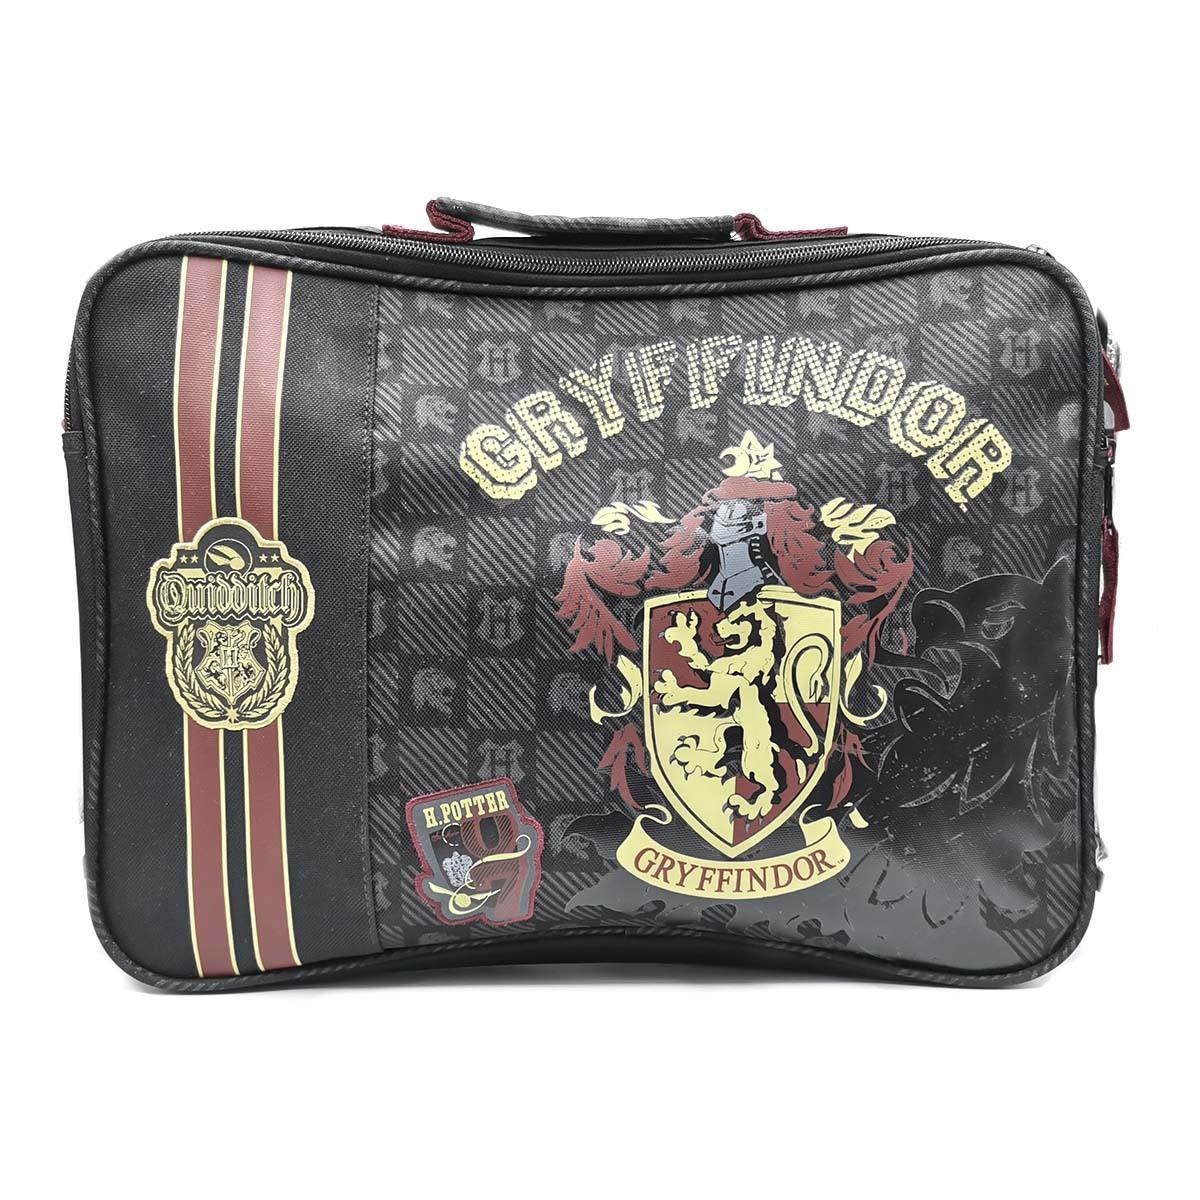 Bandolera Gryffindor Harry Potter